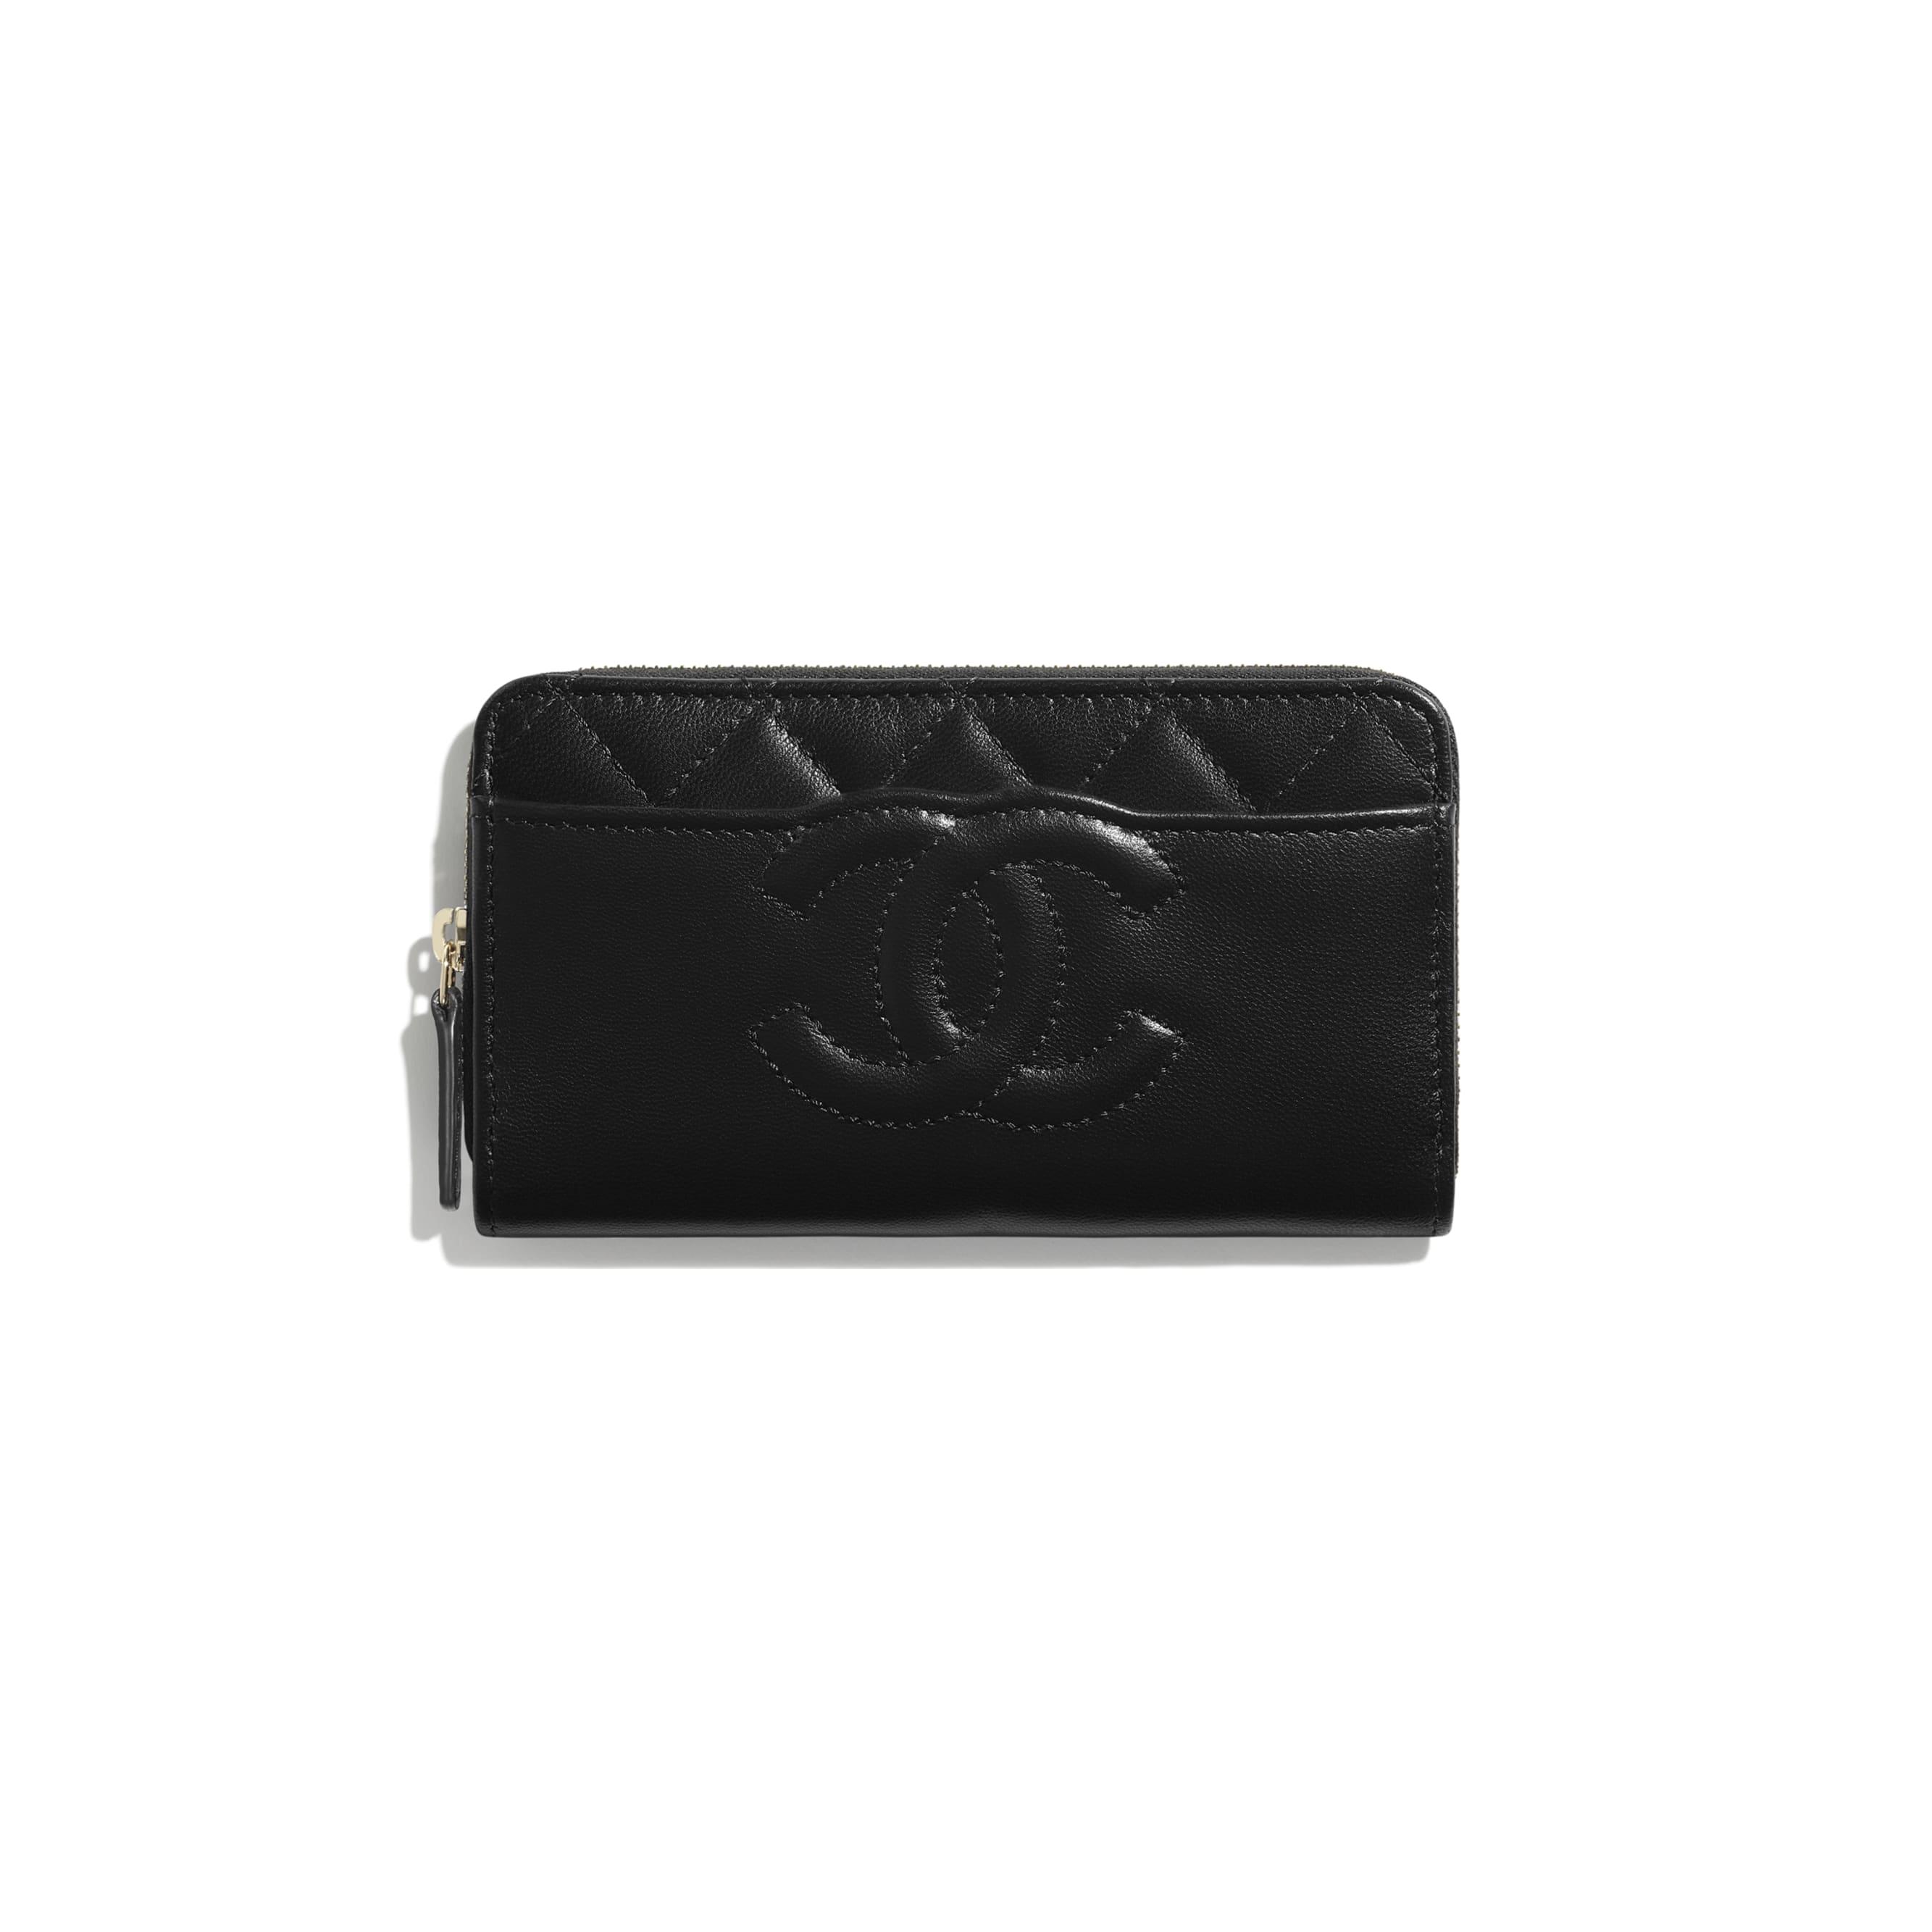 Zip Wallet - Black - Goatskin & Gold-Tone Metal - CHANEL - Default view - see standard sized version